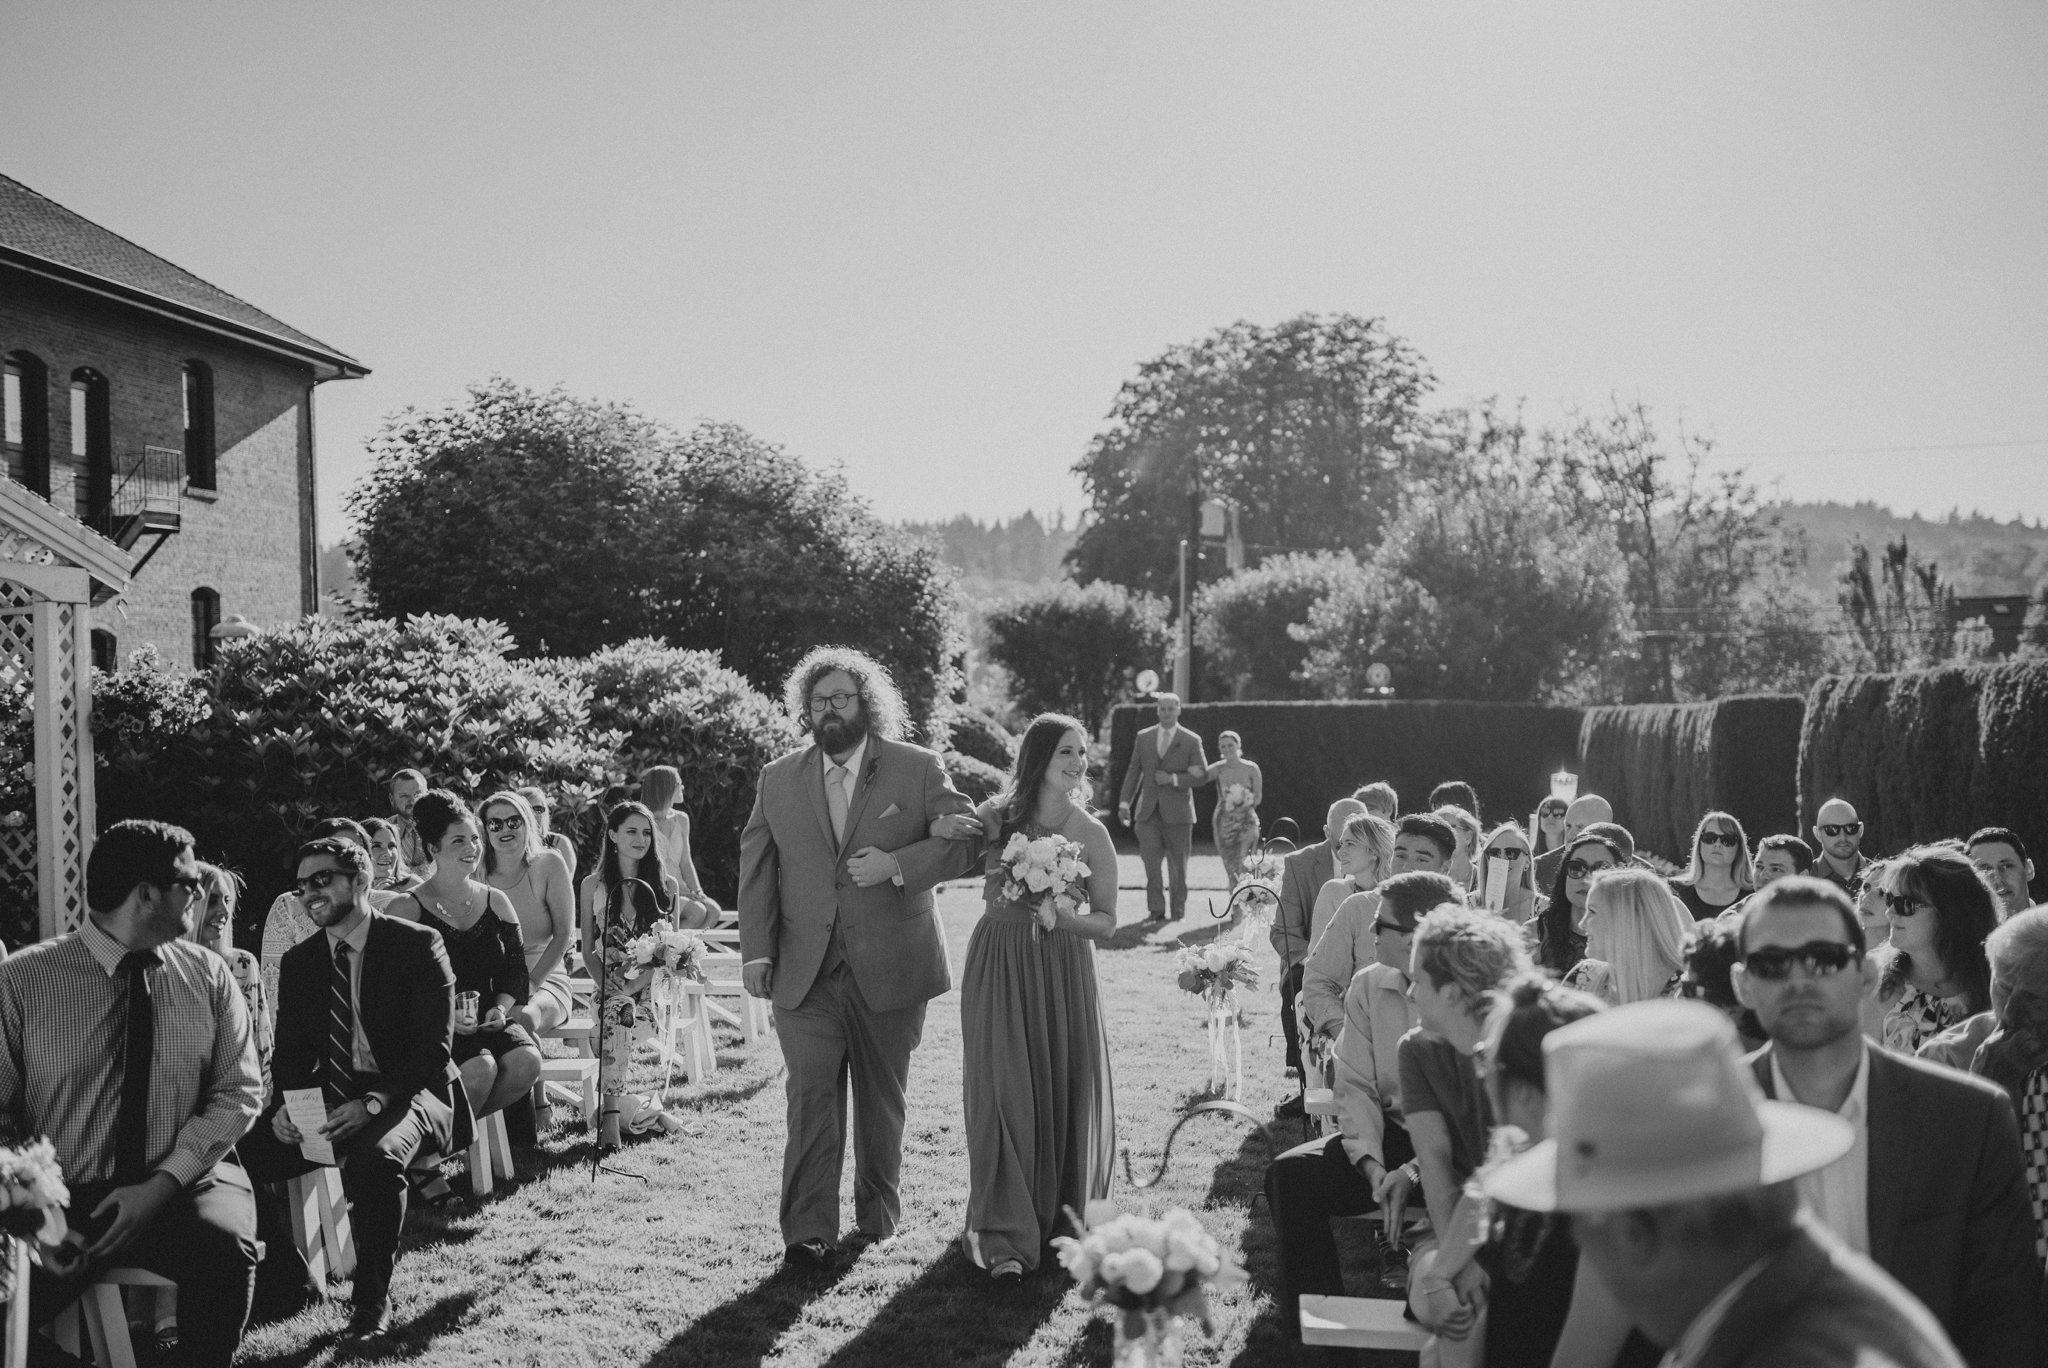 hollywood-school-house-wedding-seattle-photographer-caitlyn-nikula-68.jpg